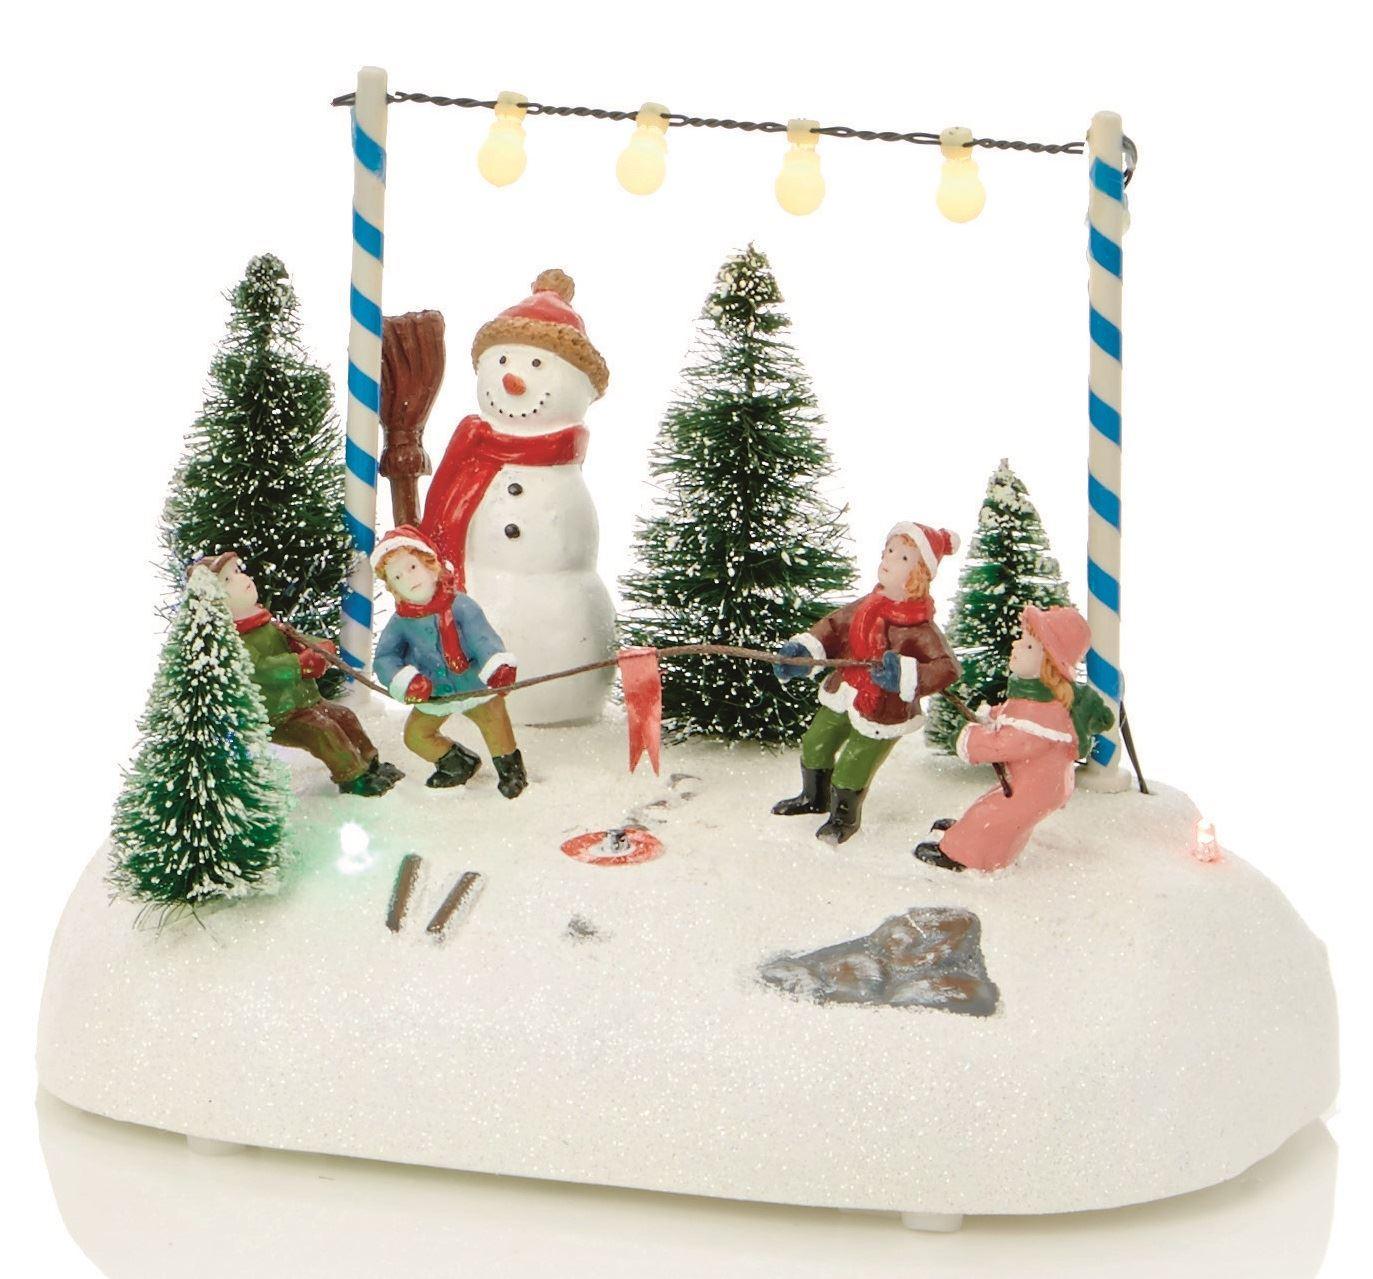 LIGHT UP 15cm Cute Christmas VILLAGE Scene DECORATION